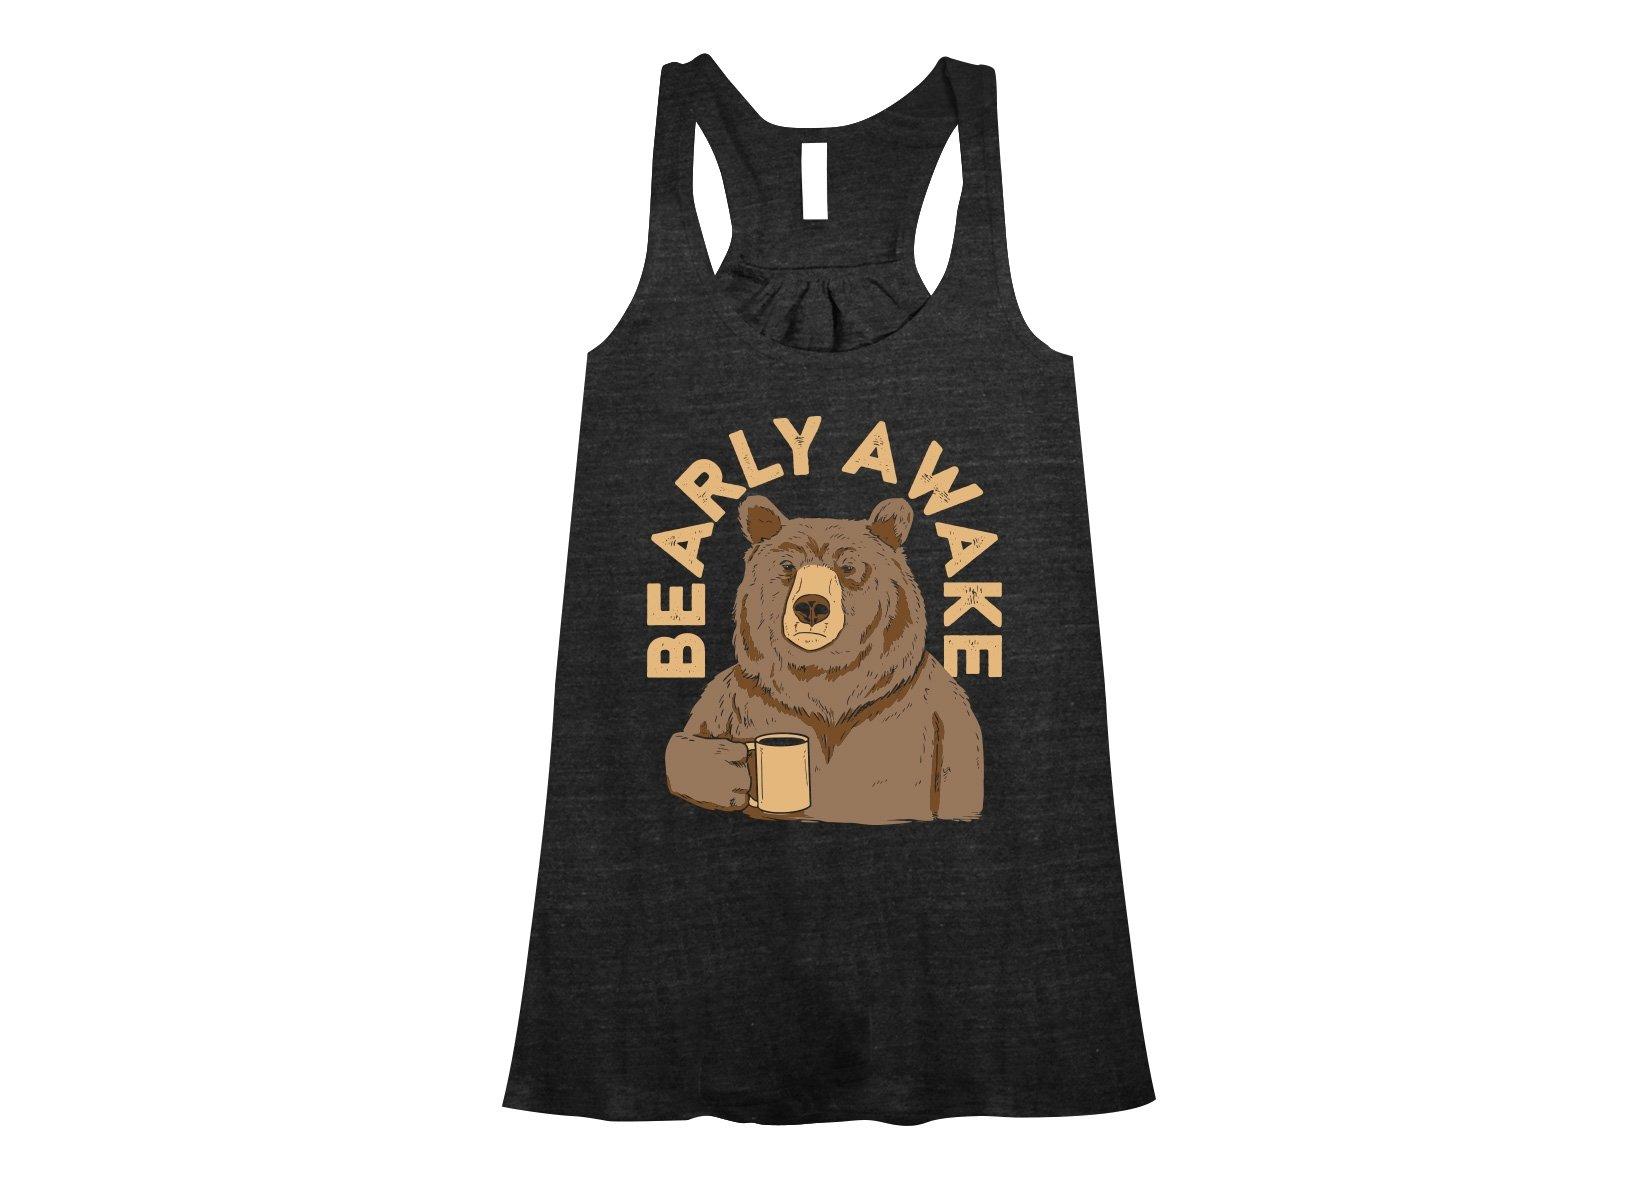 Bearly Awake on Womens Tanks T-Shirt